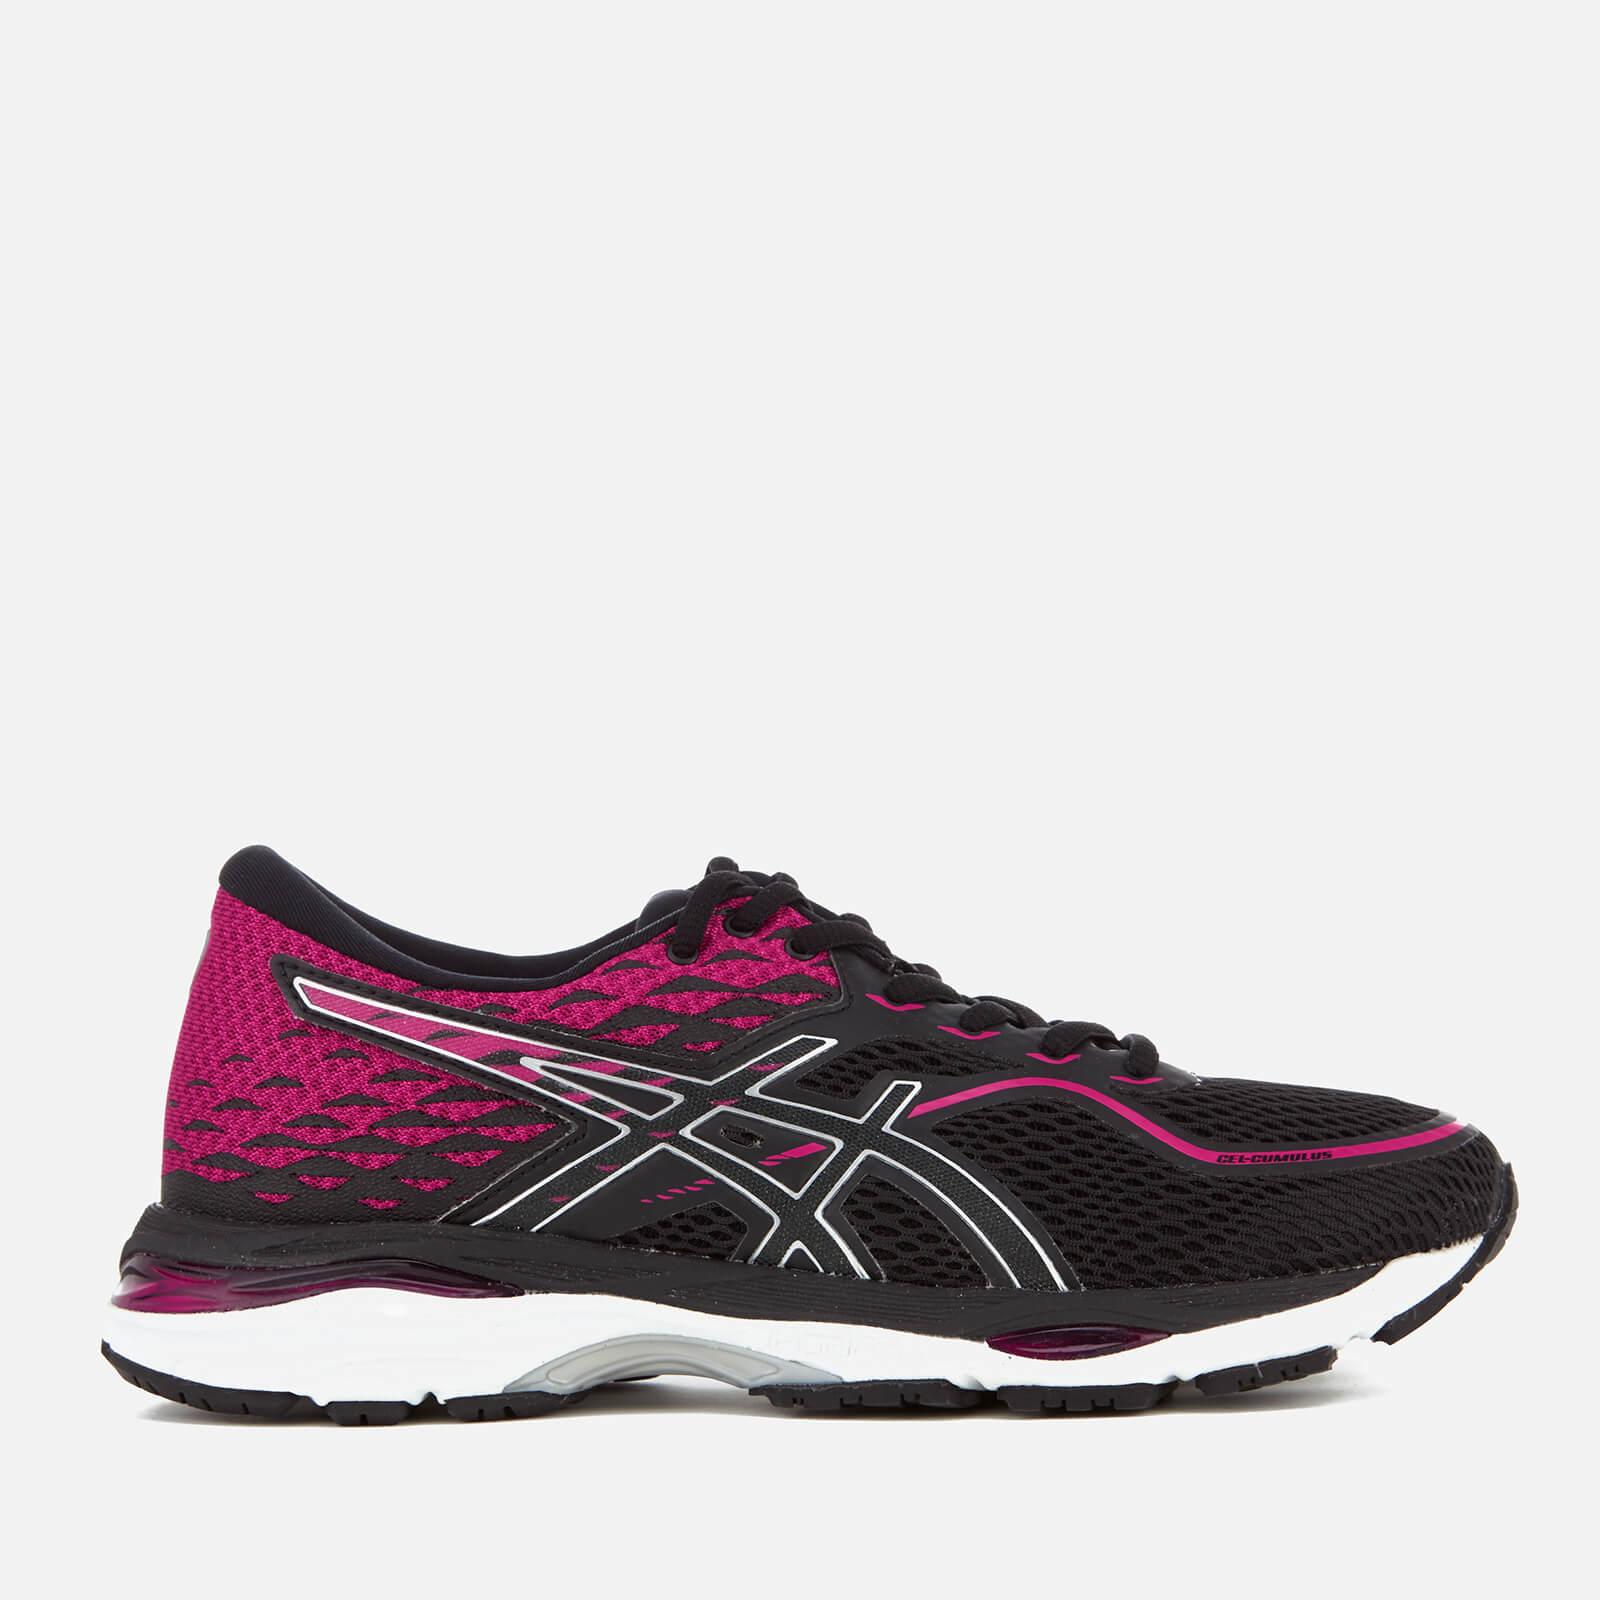 huge selection of 629c6 36206 Asics Running Women s Gel Cumulus 19 Trainers - Black Silver Pink Womens  Footwear   TheHut.com